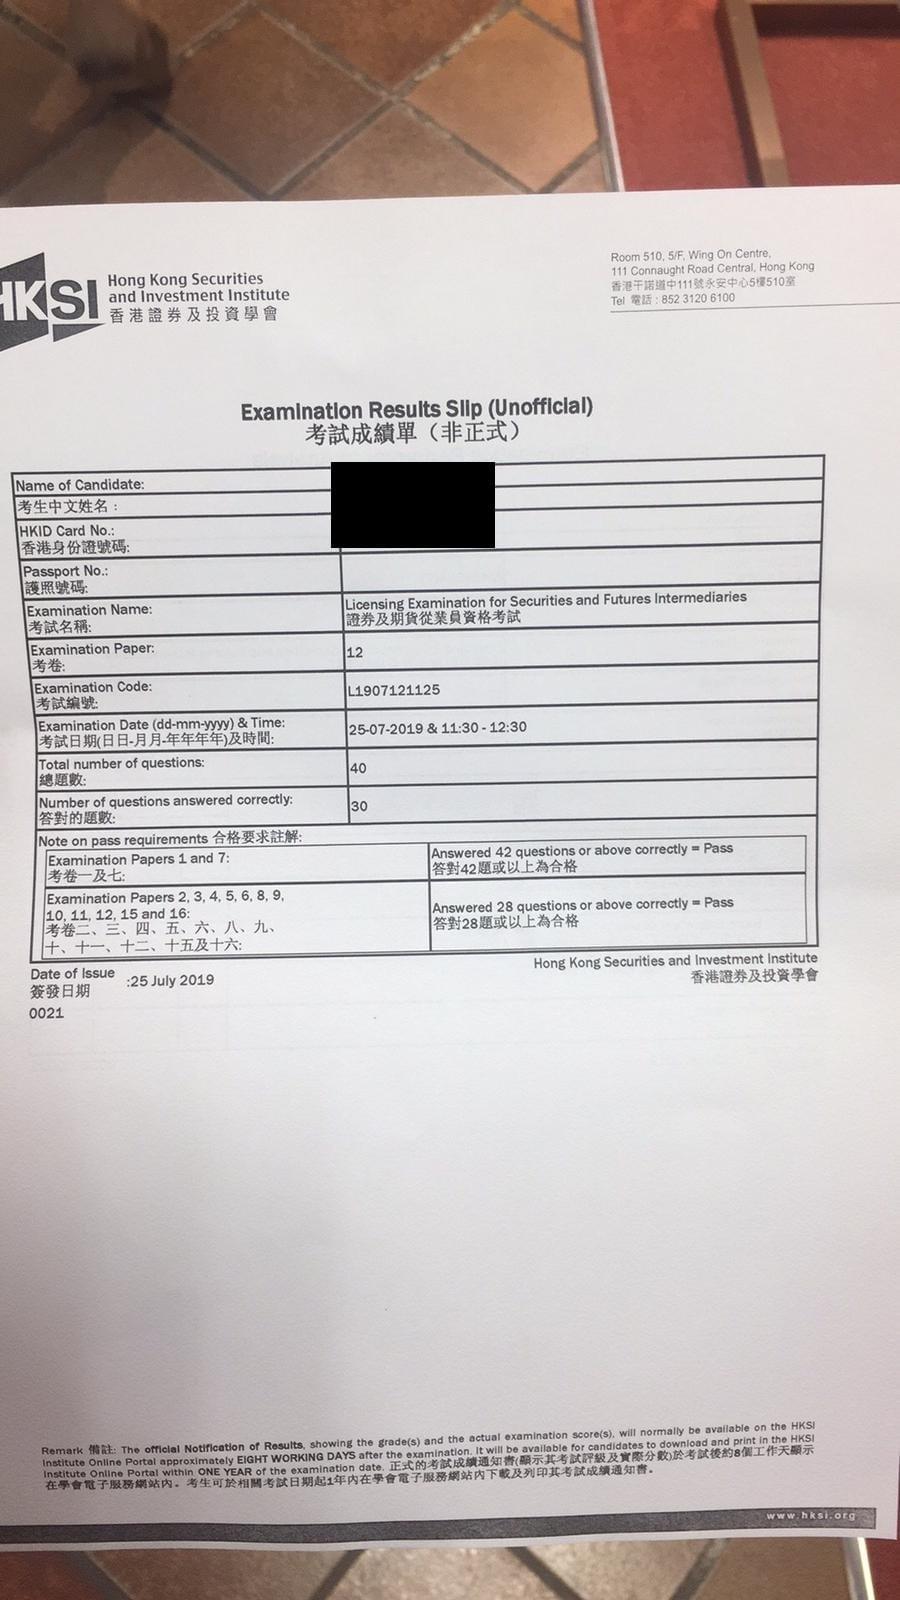 BH 25/7/2019 LE Paper 12 證券期貨從業員資格考試卷十二 Pass